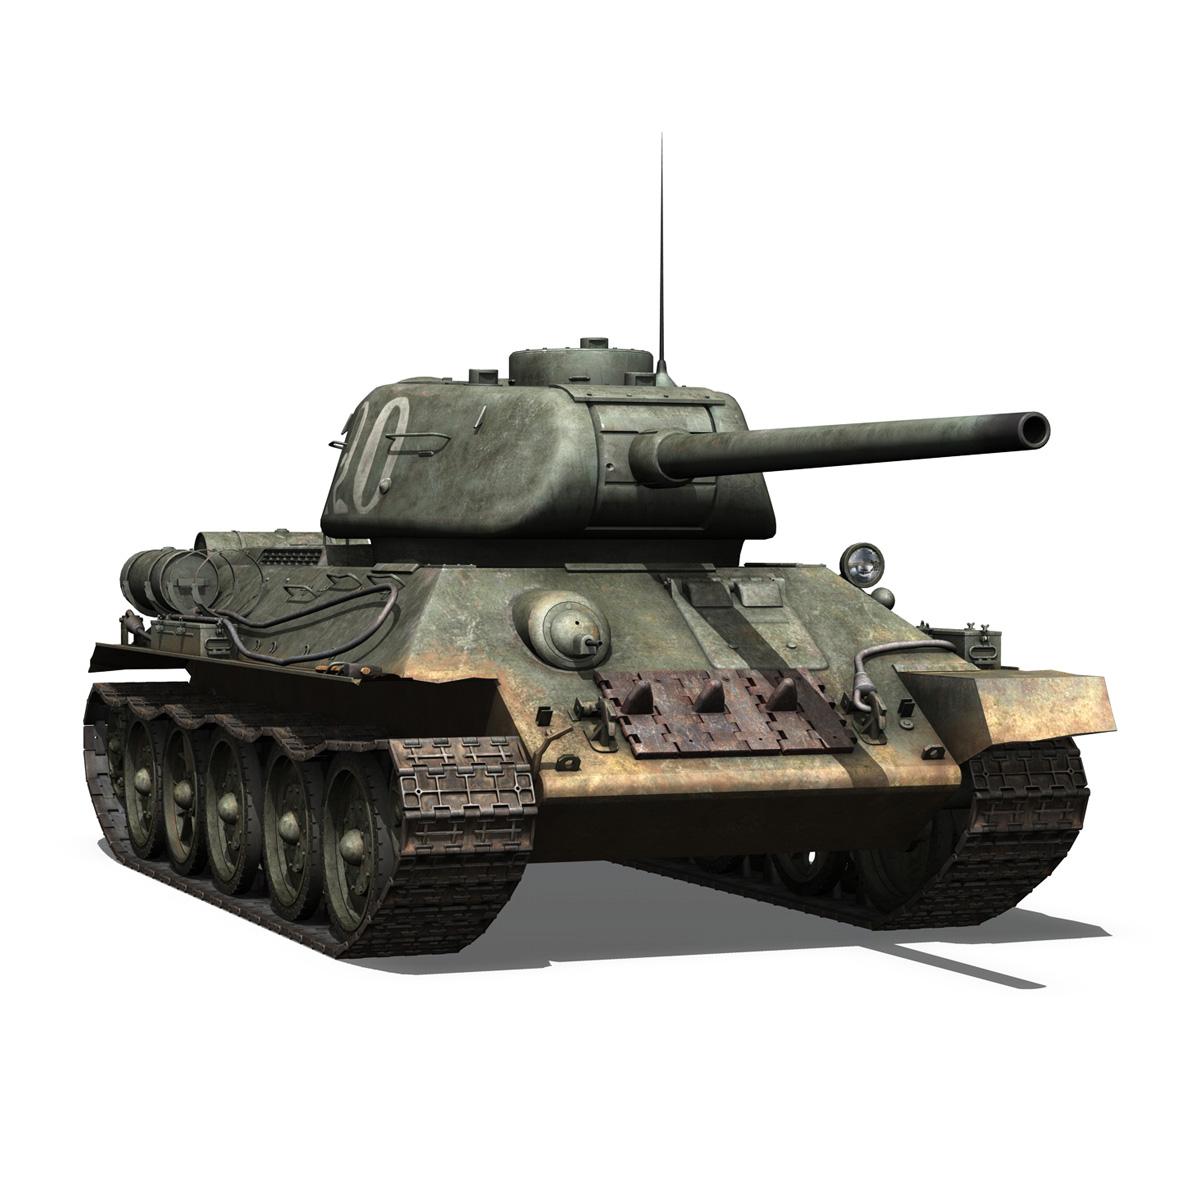 t-34 85 – soviet medium tank – 120 3d model 3ds fbx lwo lw lws obj c4d 265376